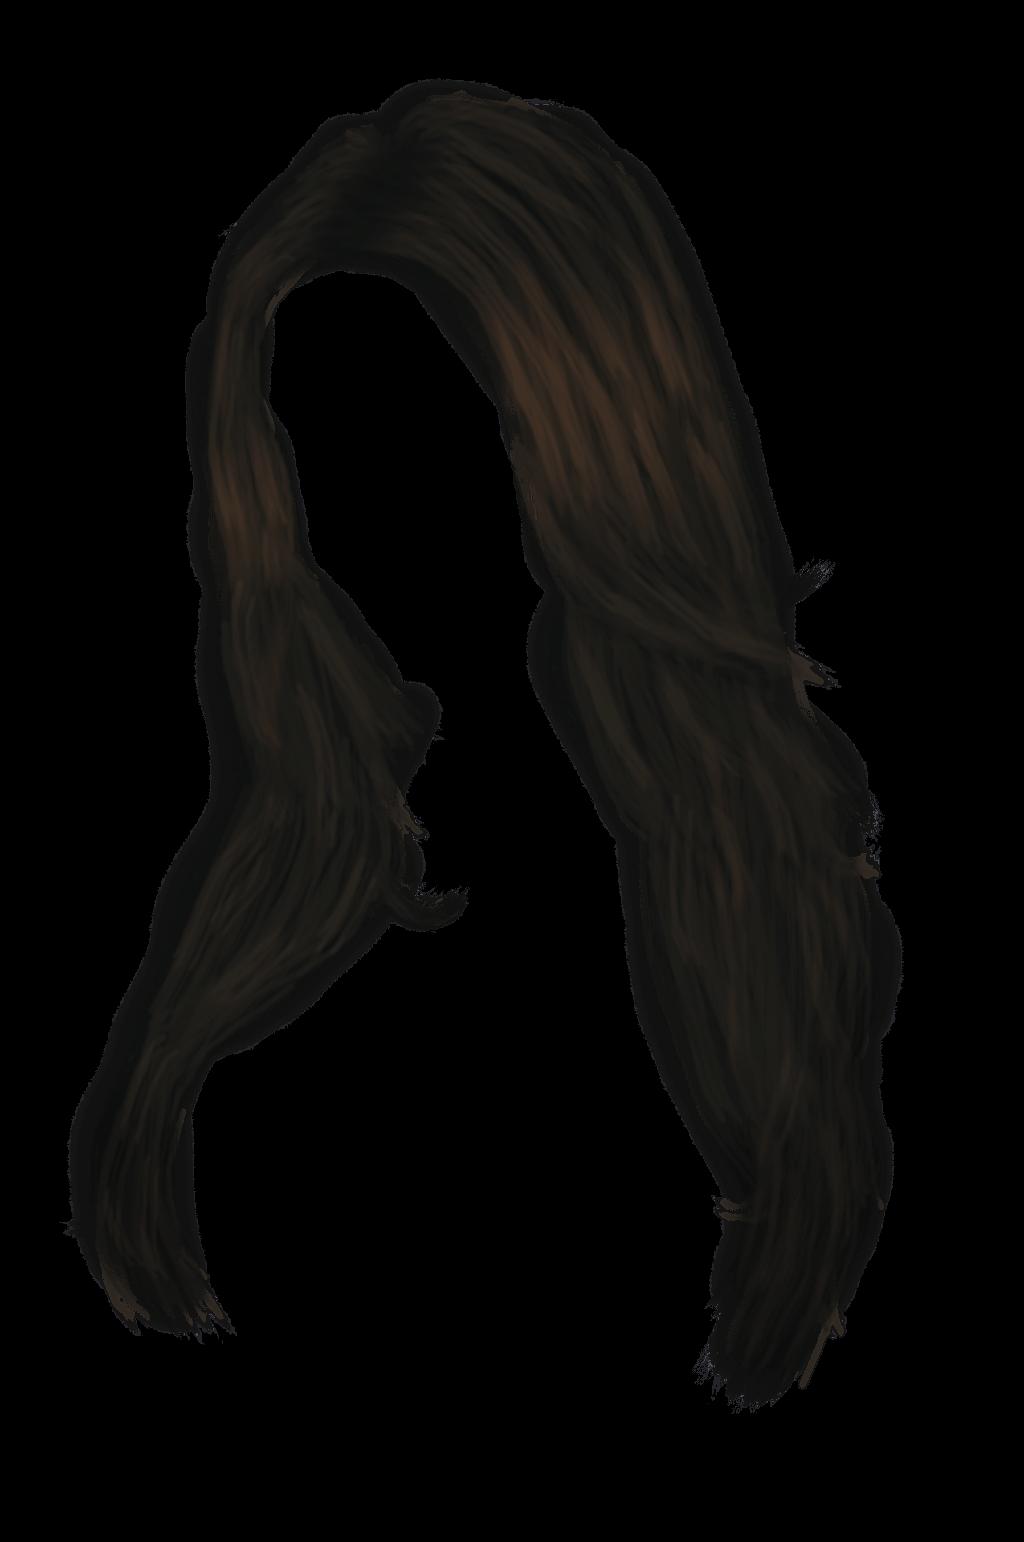 Black women transparent png. Clipart girl long hair